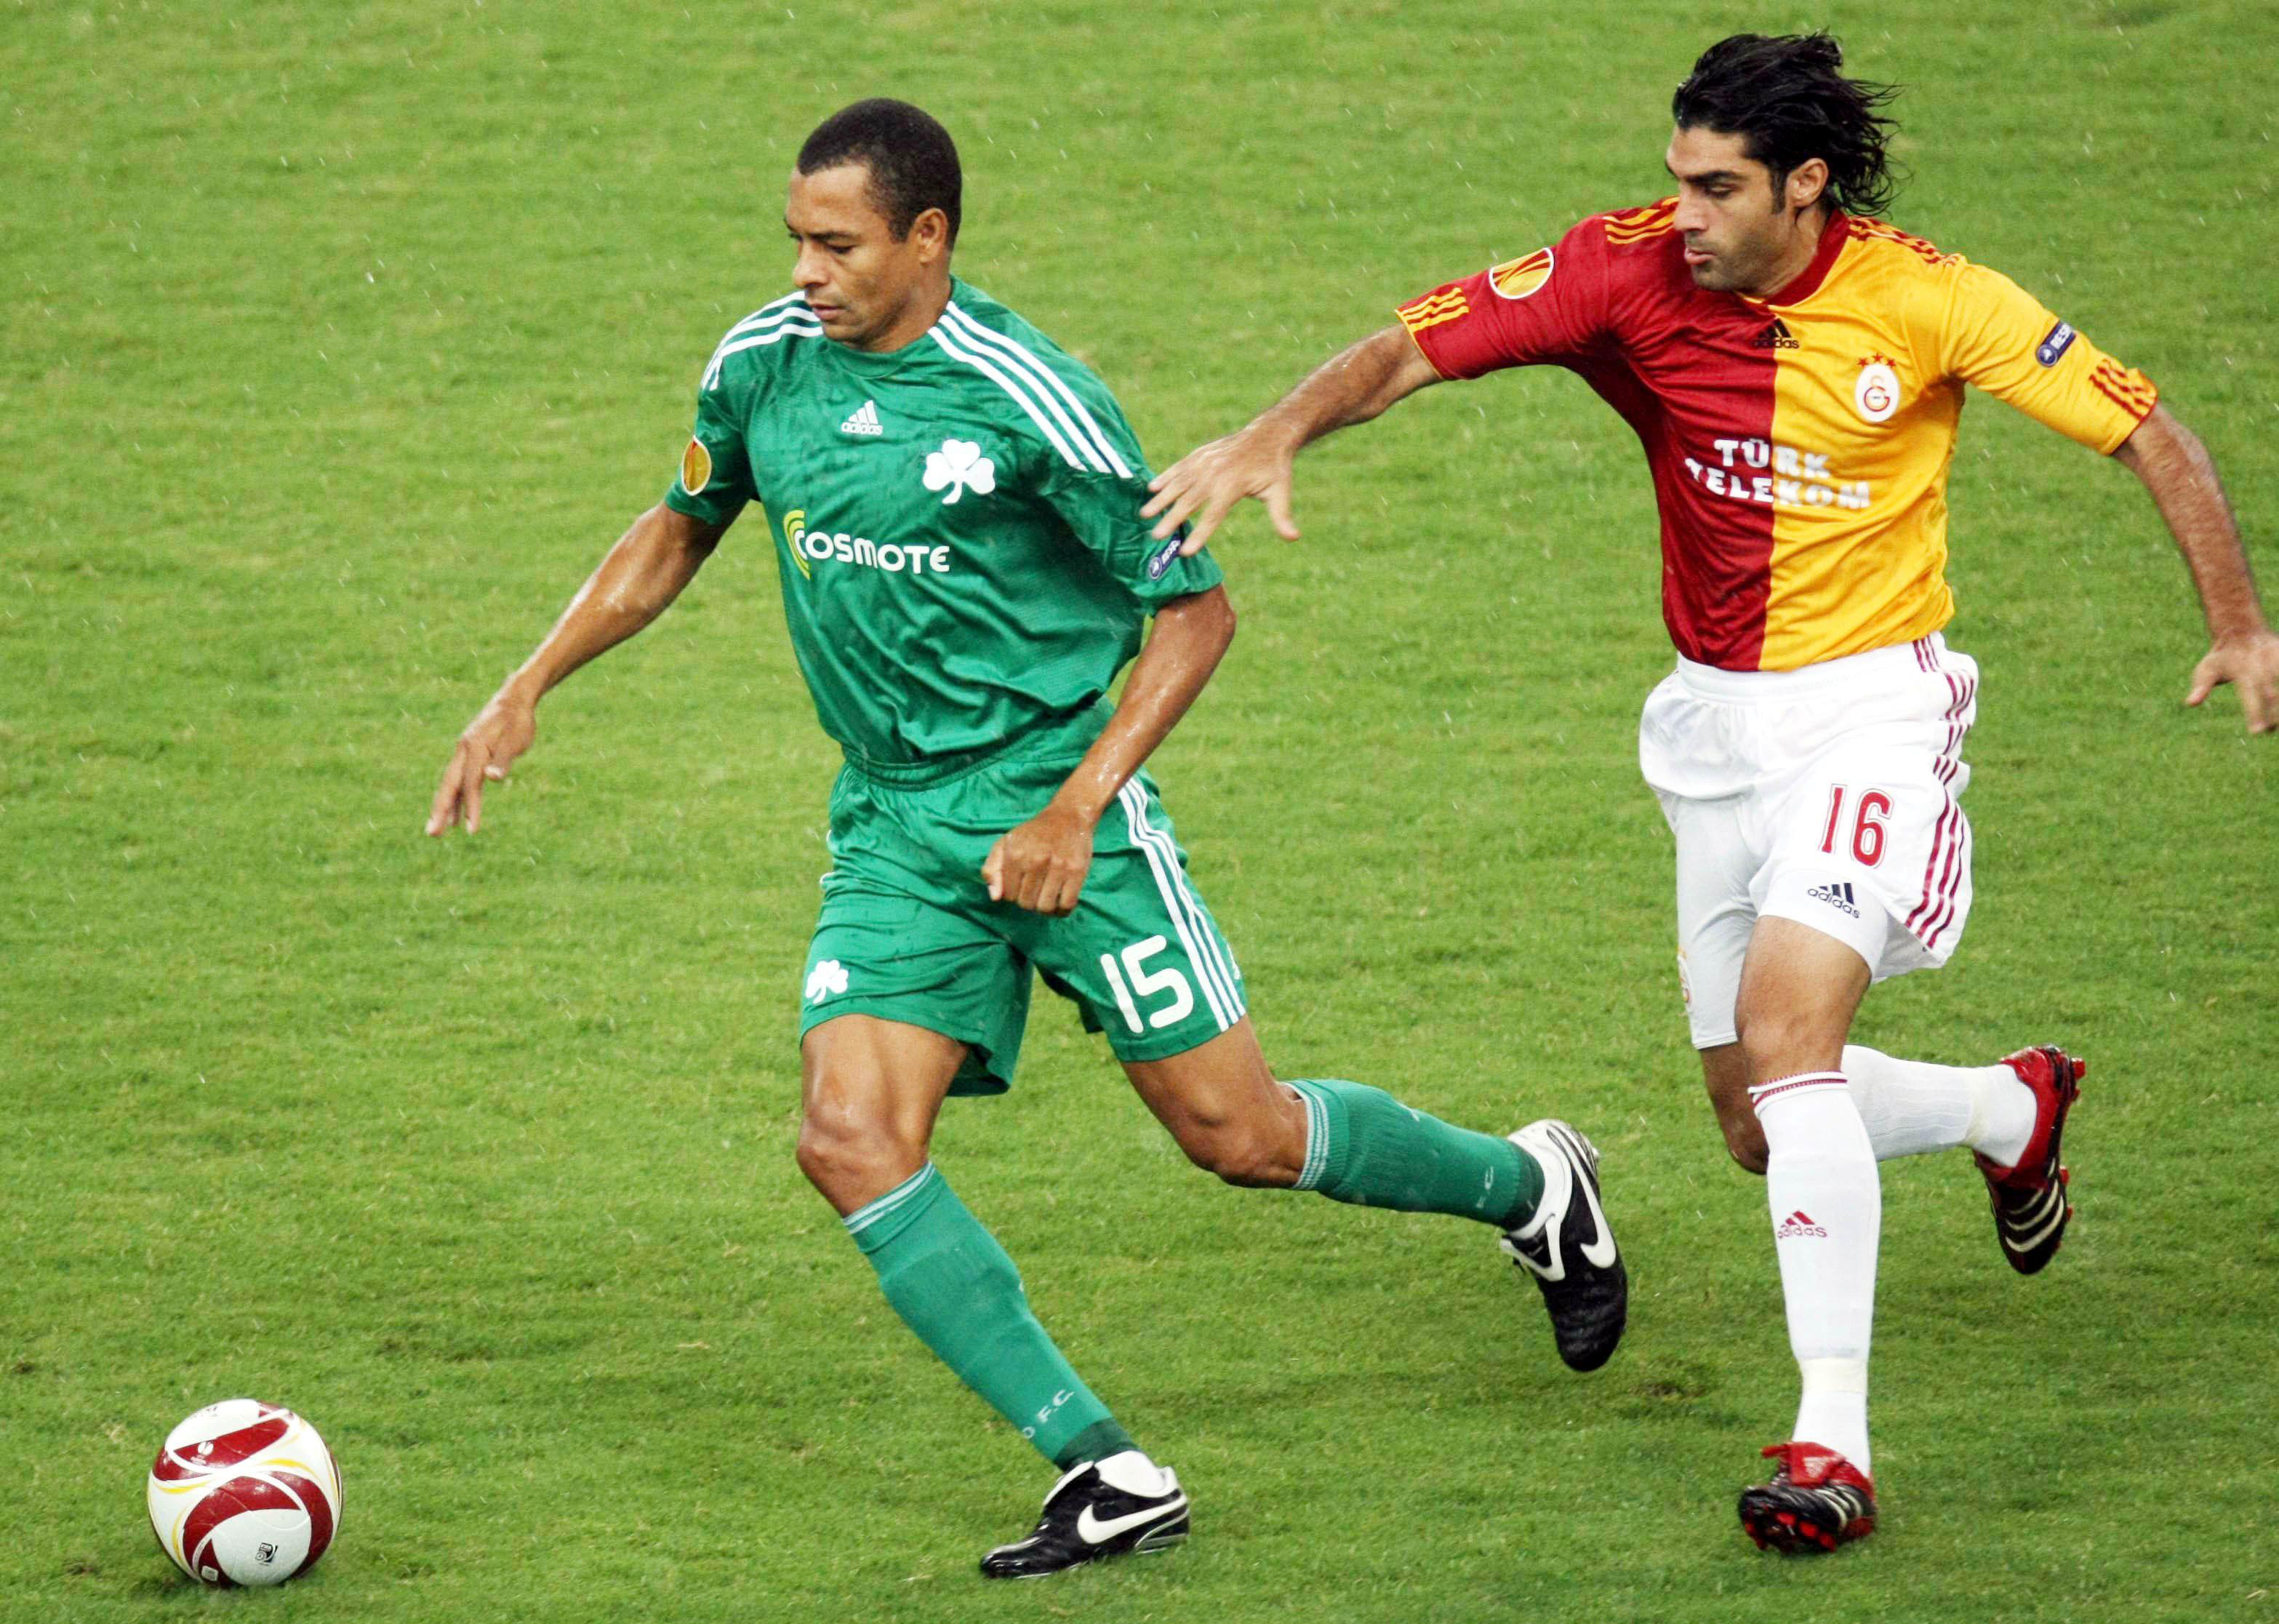 Europa League: Panathinaikos v Galatasaray (INTIME)